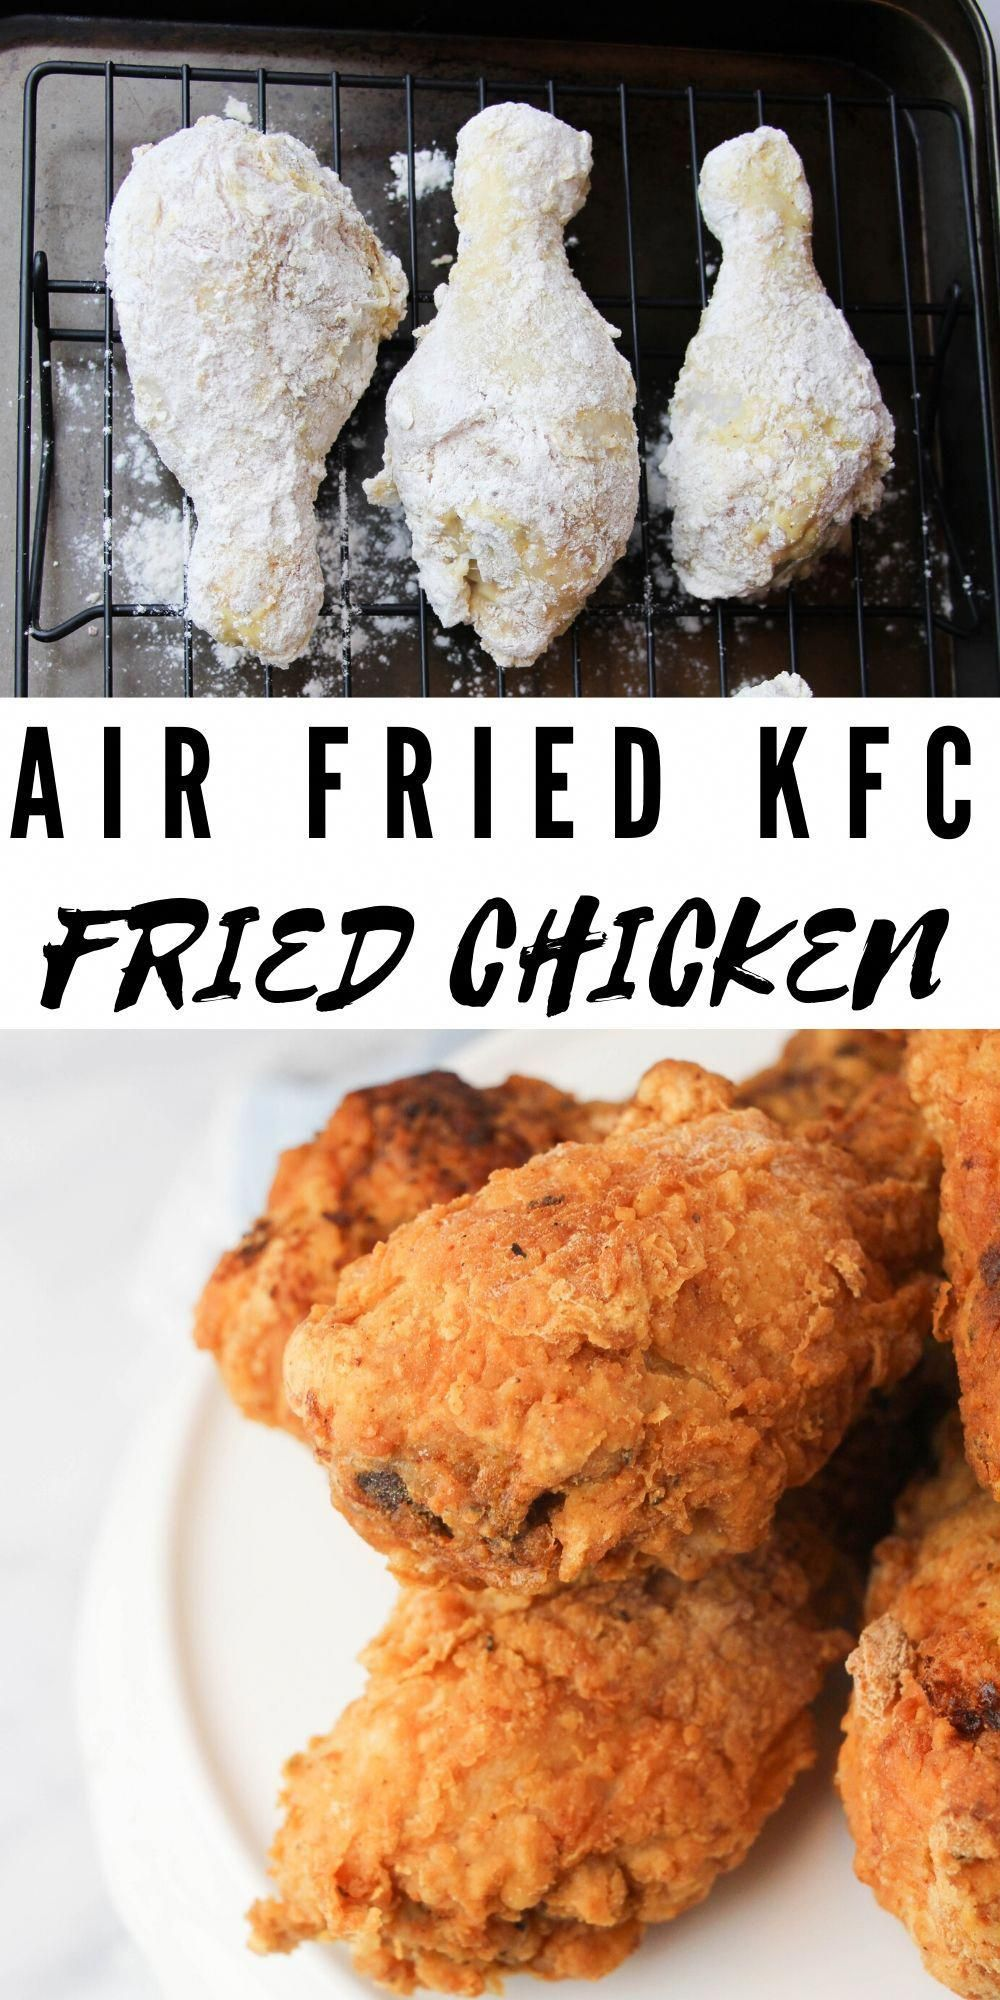 Air Fryer Fried Chicken Kfc Copycat Recipe In 2020 Air Fryer Dinner Recipes Air Fryer Recipes Healthy Recipes